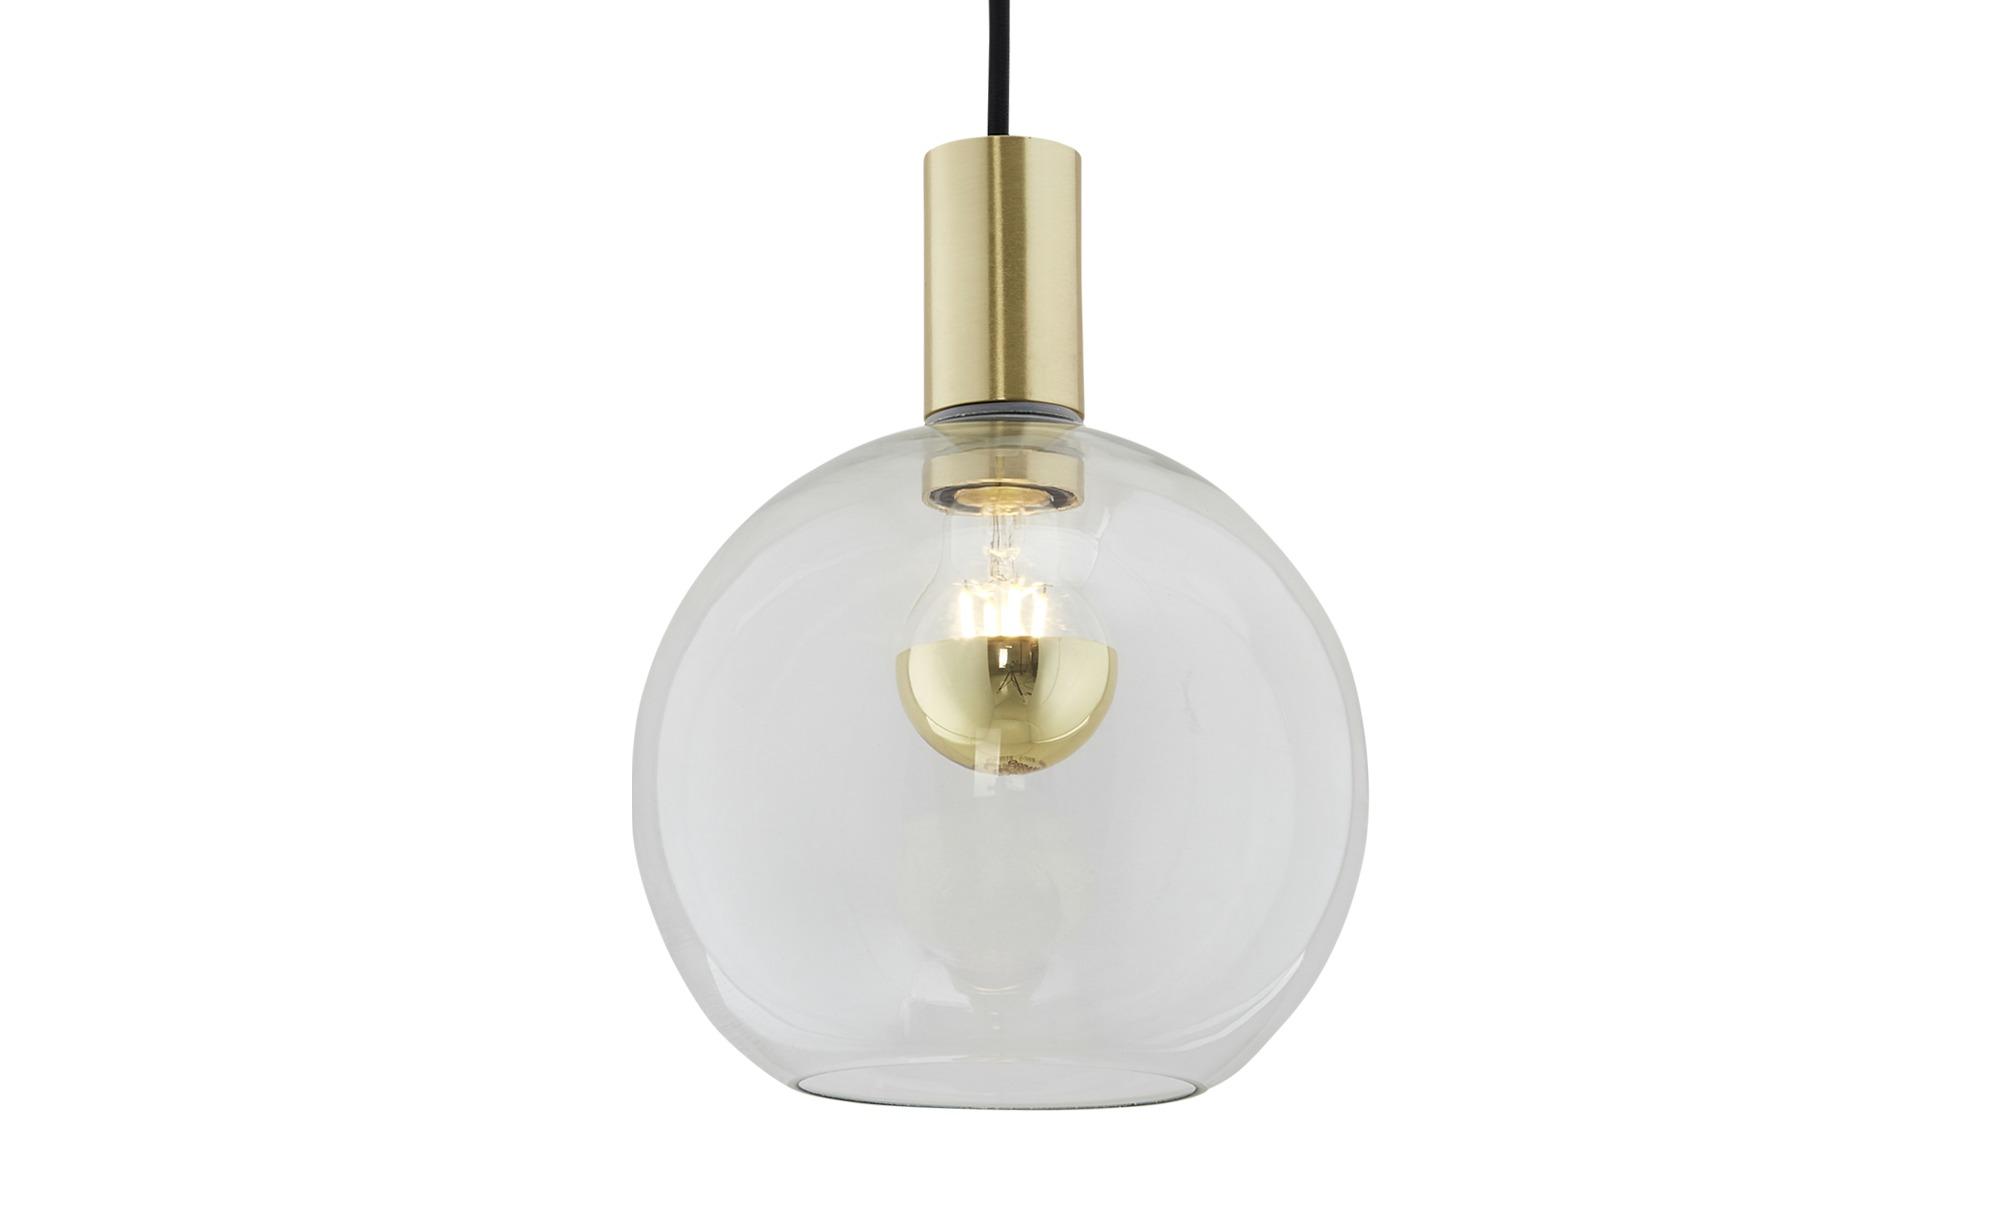 Pendelleuchte, 1-flammig messing-matt ¦ gold ¦ Maße (cm): H: 178 Ø: [20.0] Lampen & Leuchten > Innenleuchten > Pendelleuchten - Höffner